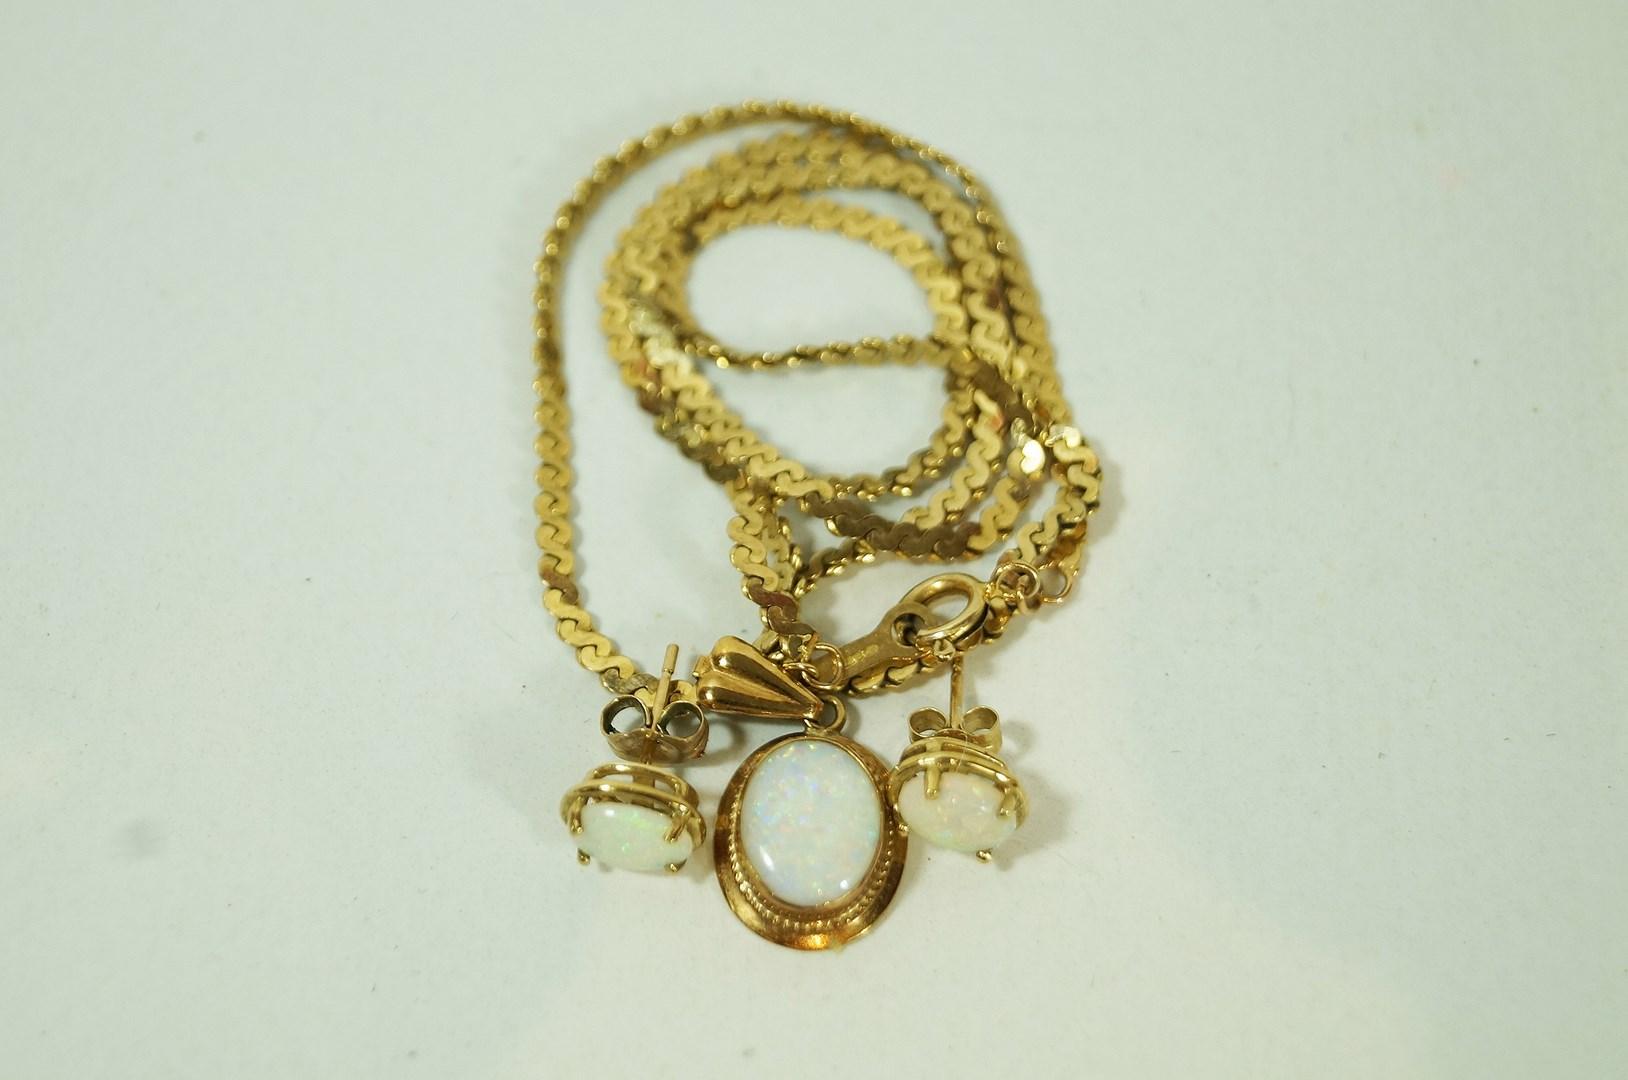 Lot 30 - An opal 9 carat gold pendant, on a 9 carat gold S link chain, pendant 2.